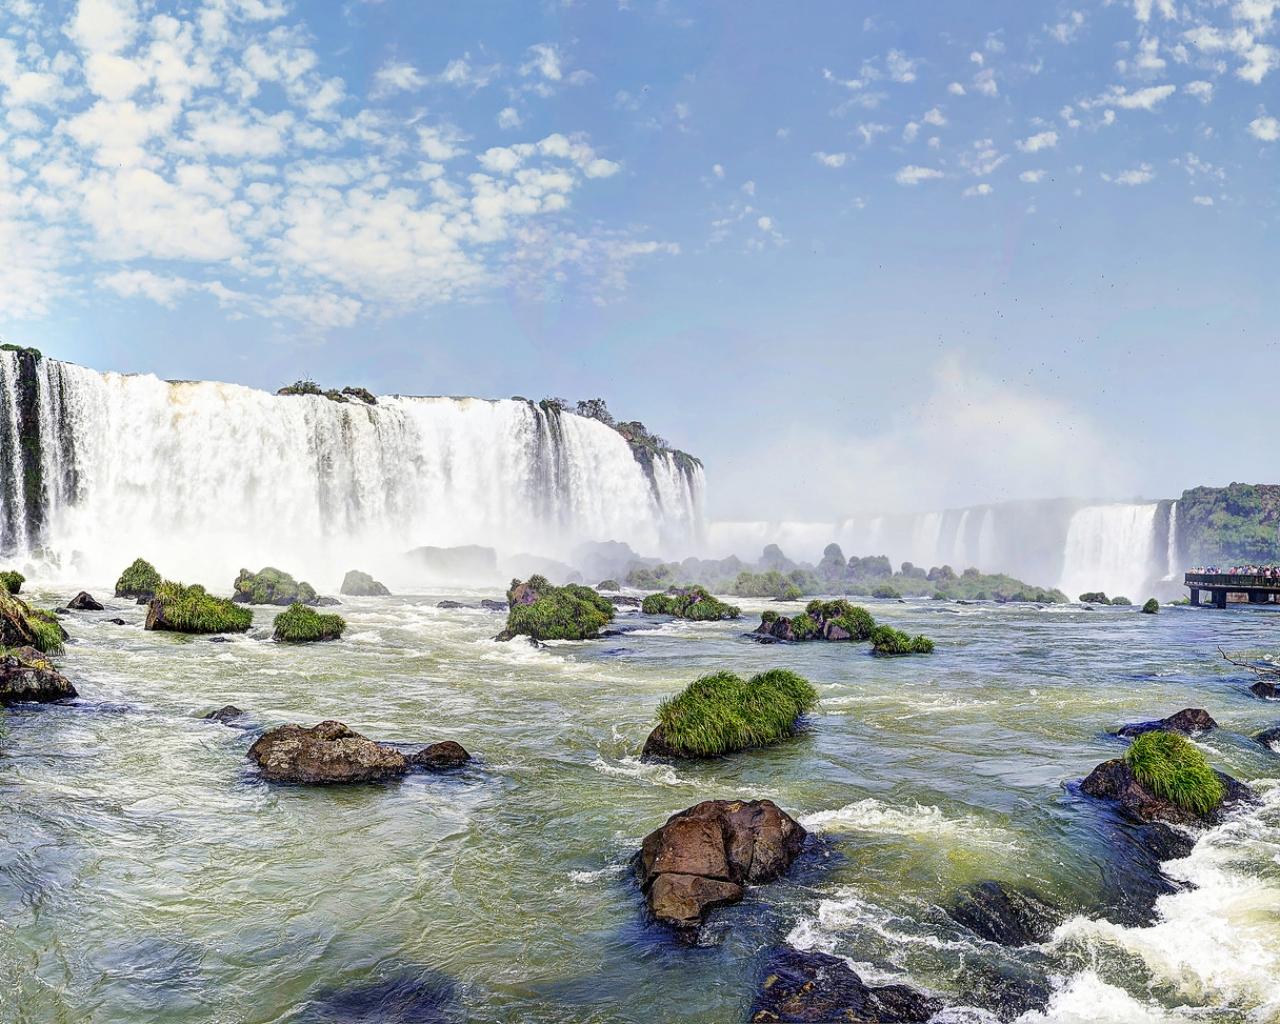 Cataratas de Iguazu - 1280x1024